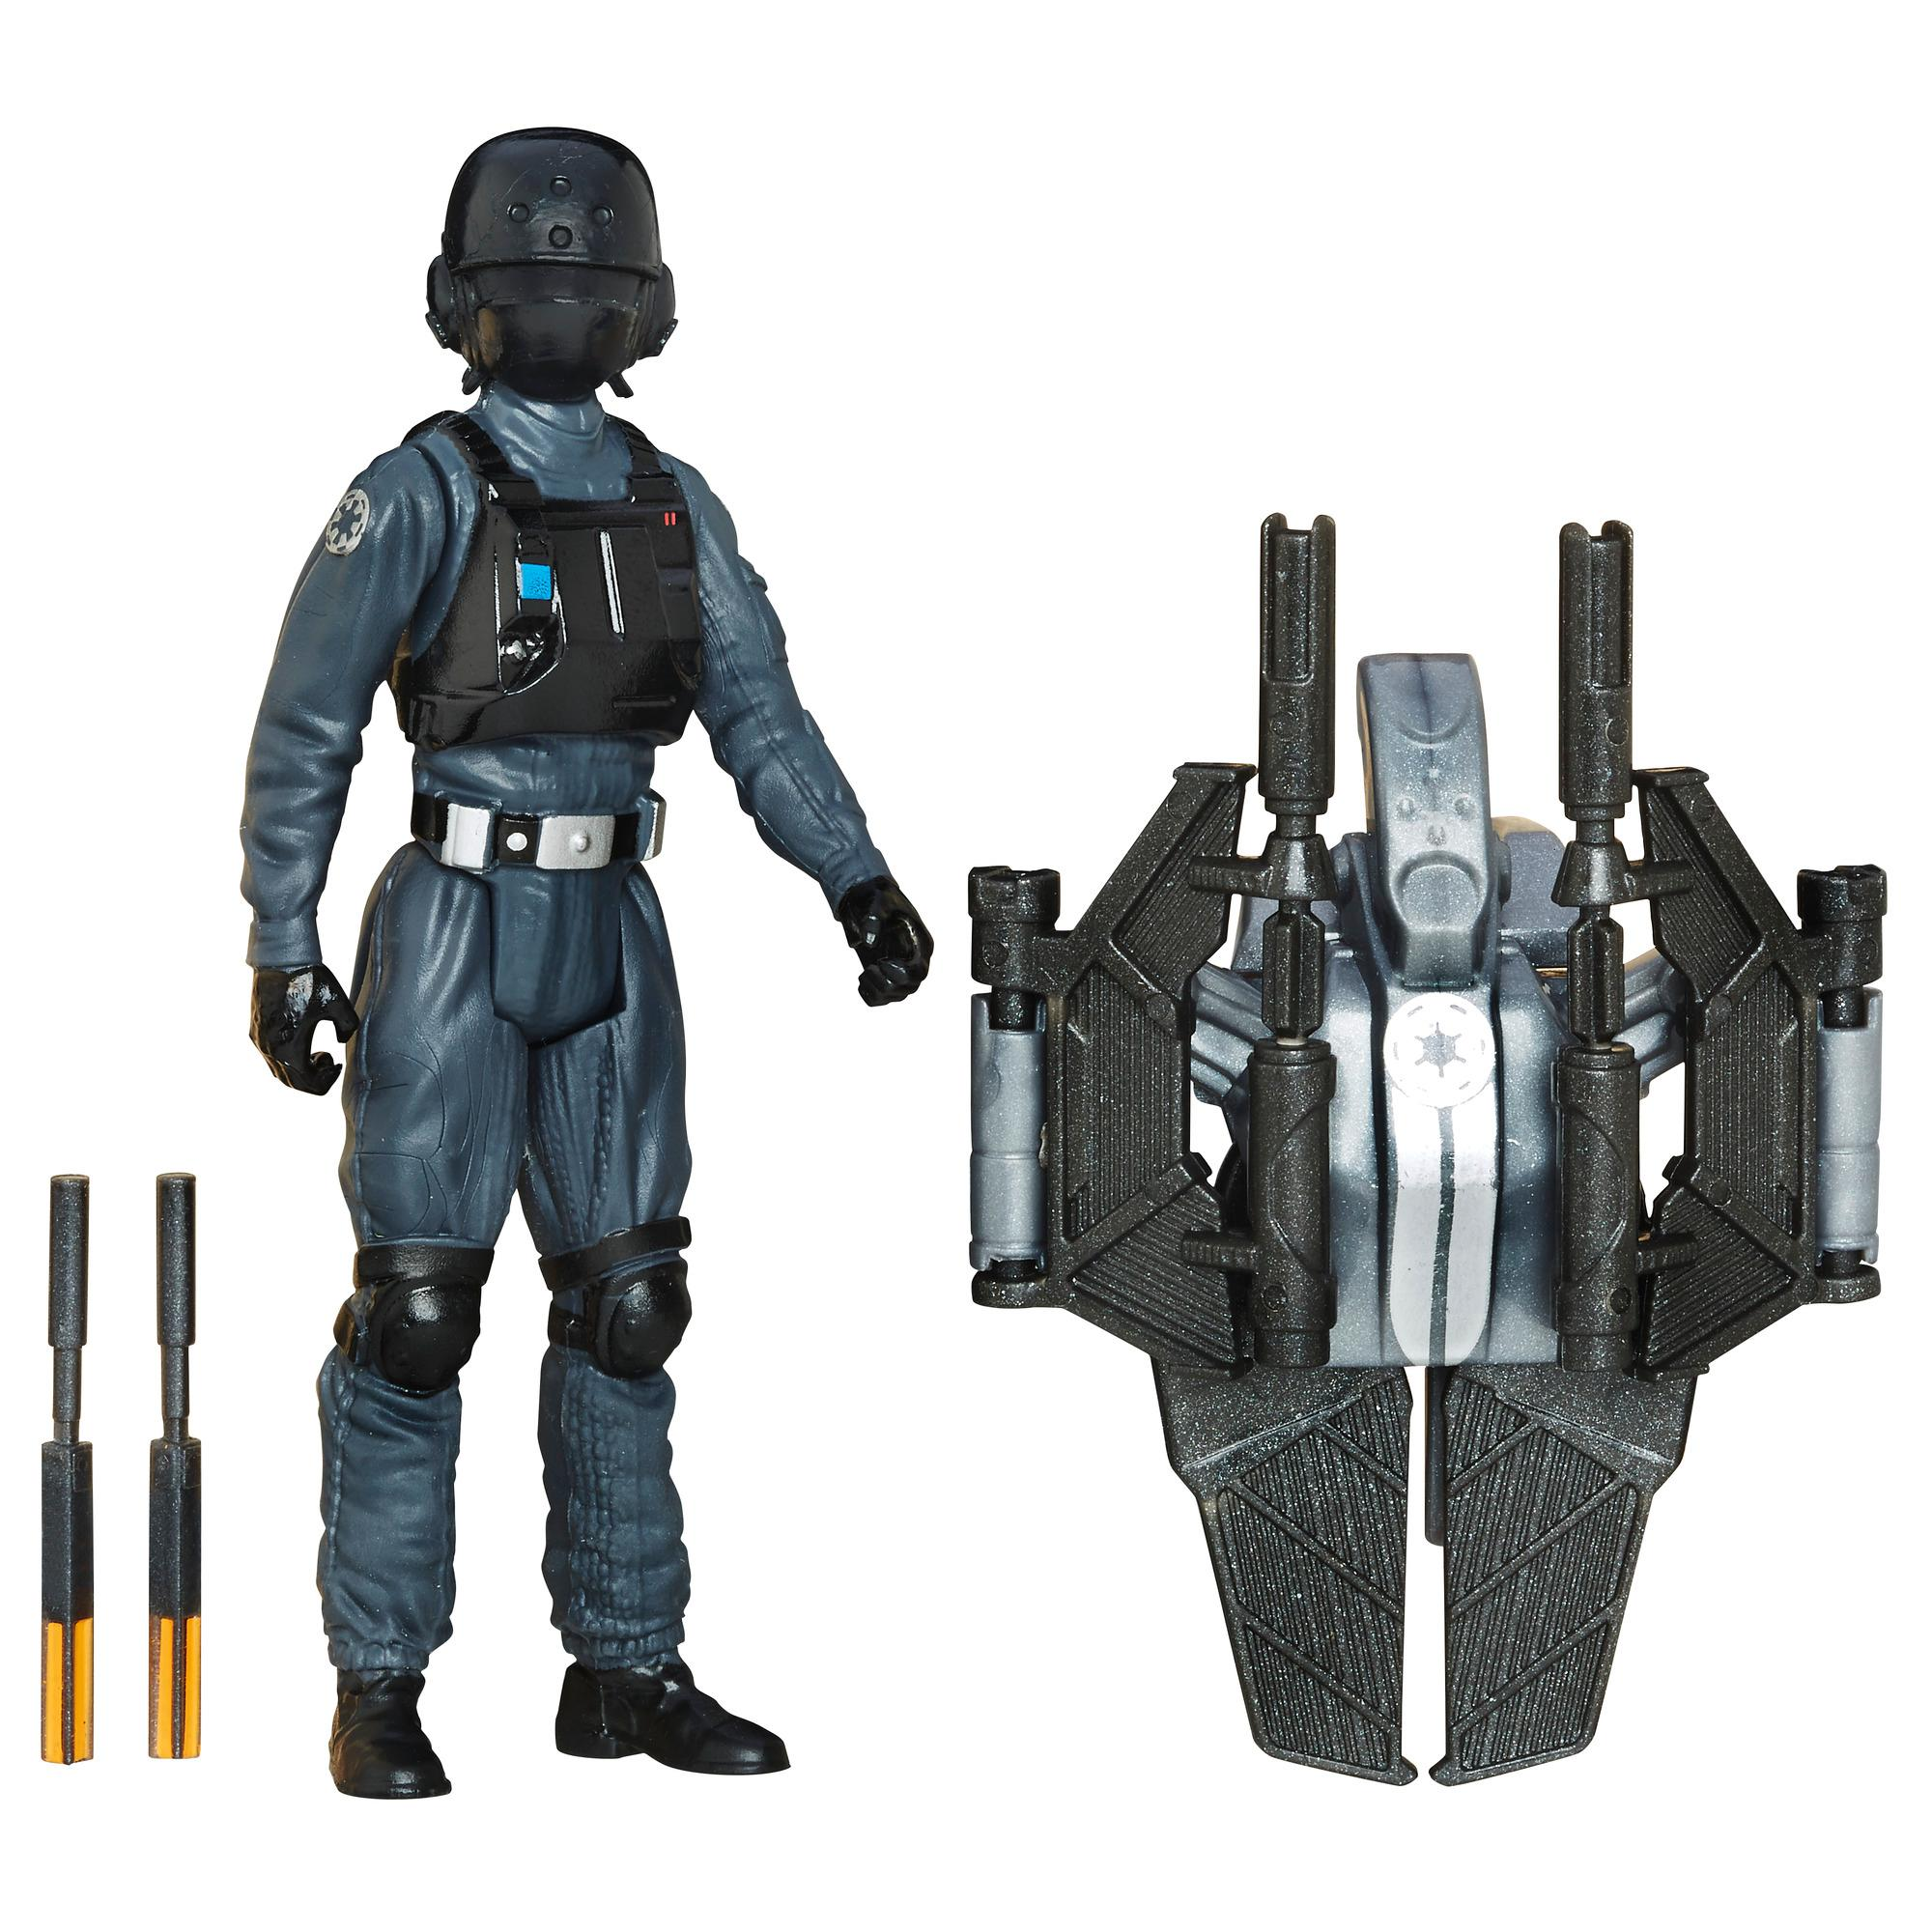 Star Wars Rogue One - Figura de personal de tierra imperial